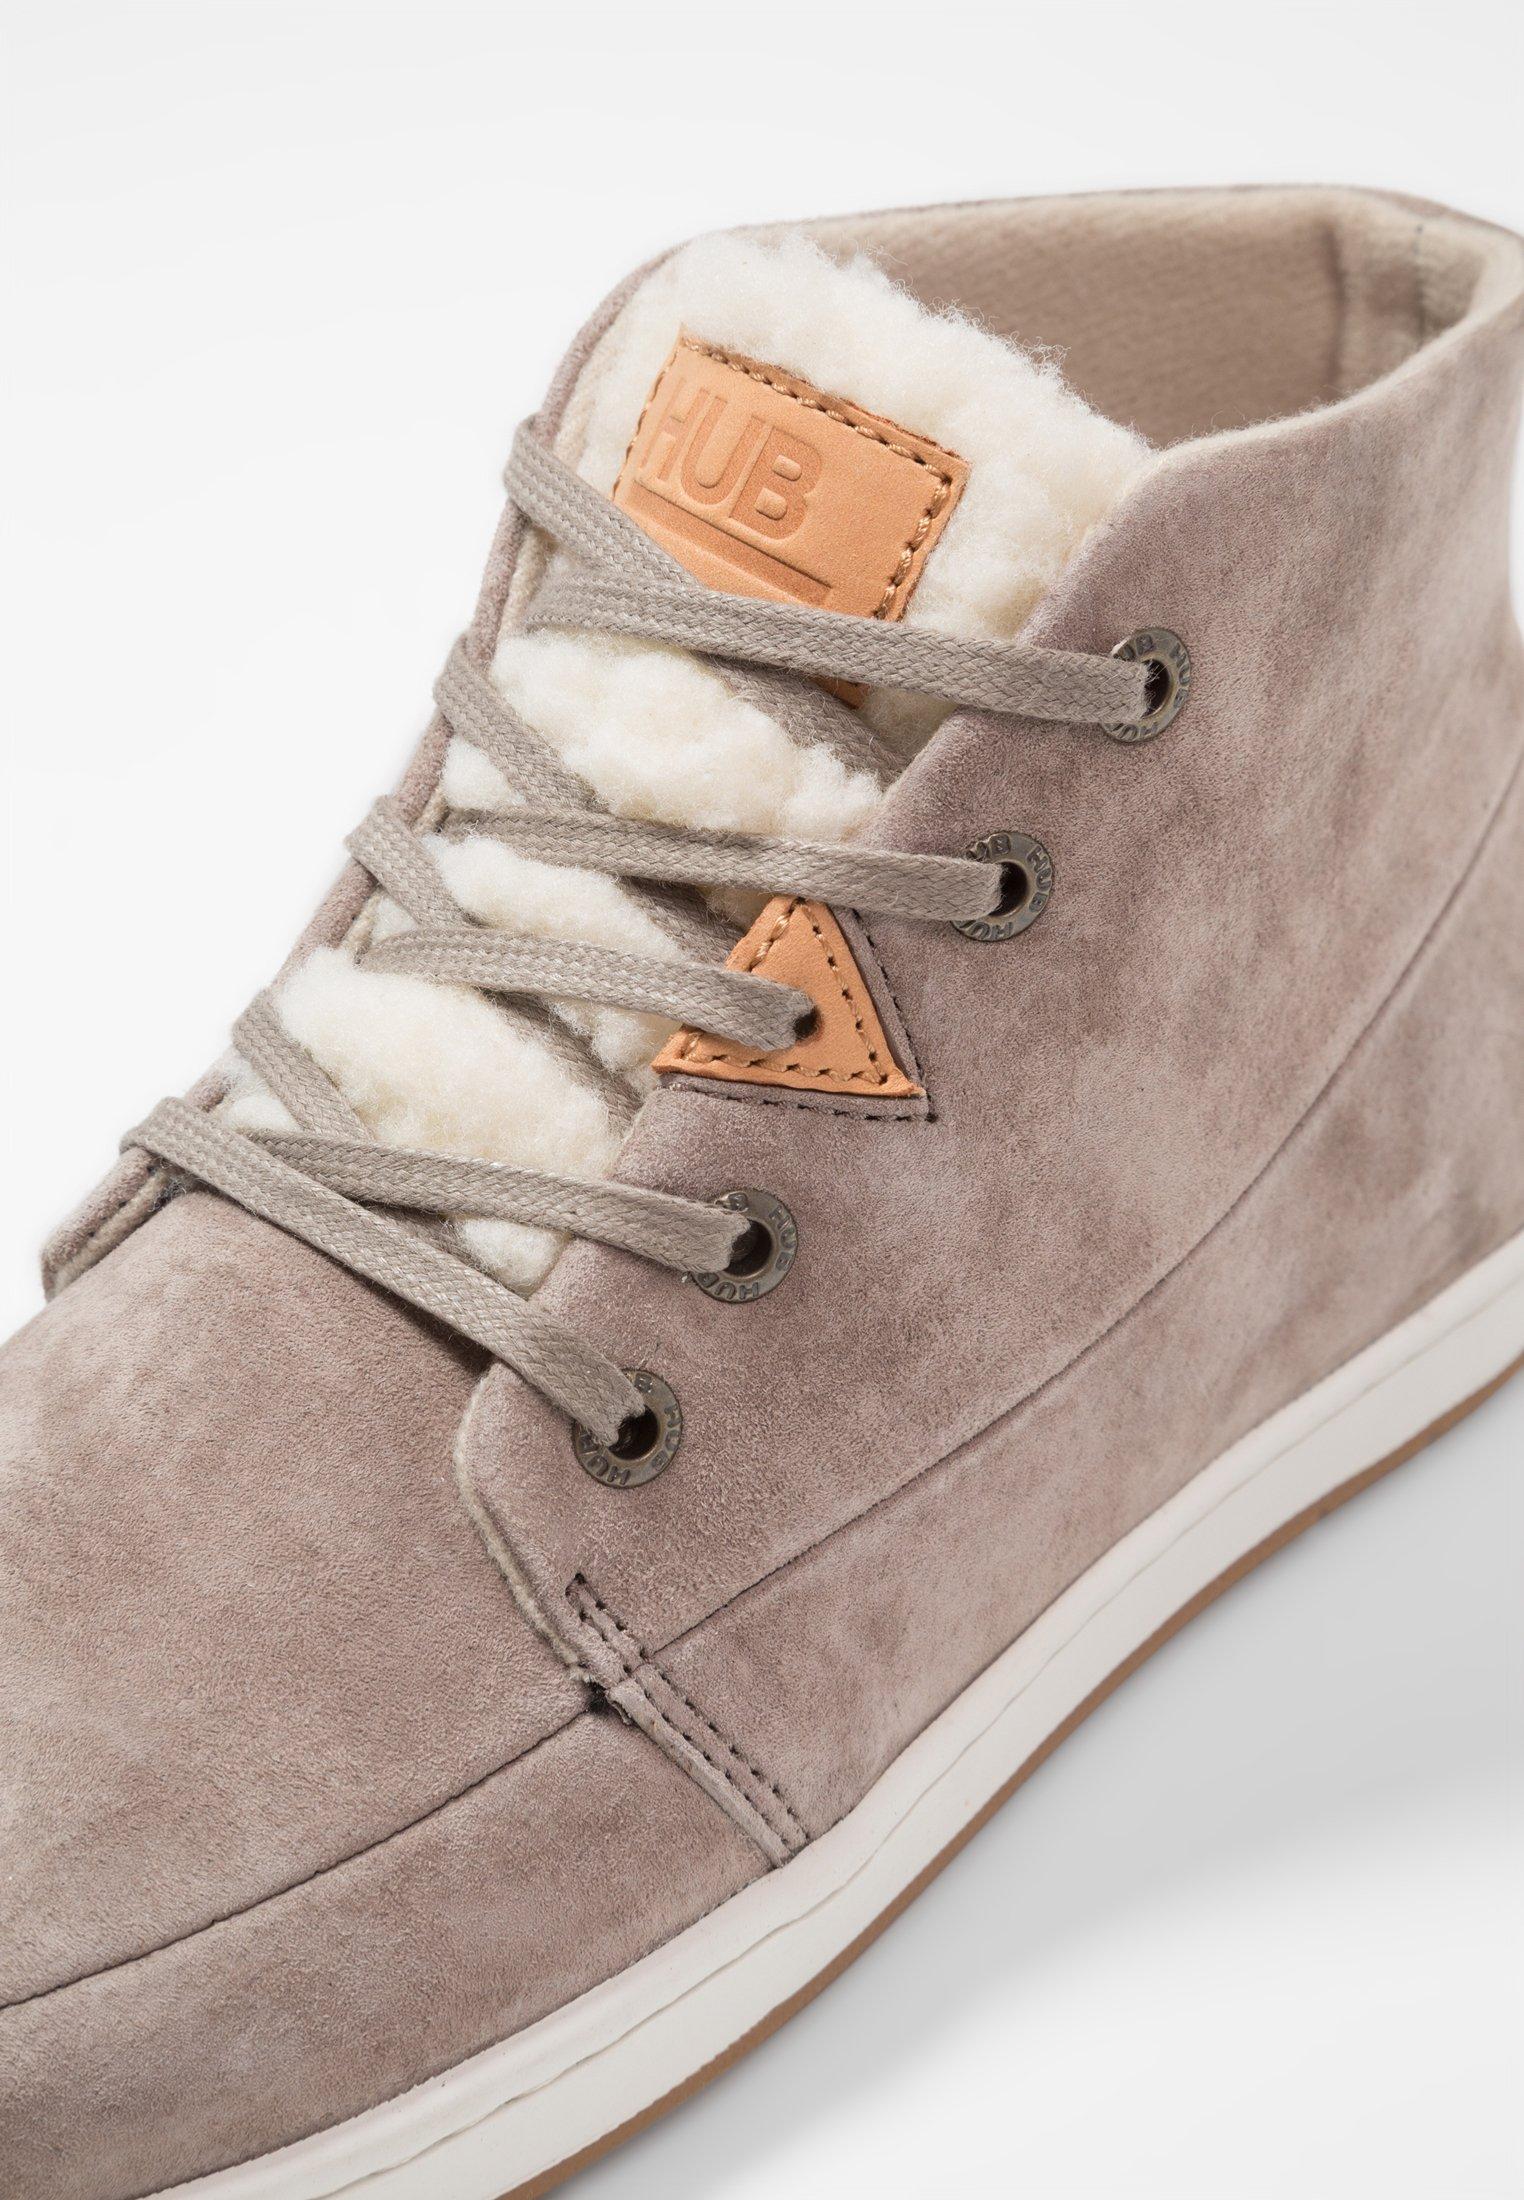 Hub Subway - Sneaker High Dark Taupe/bone/taupe